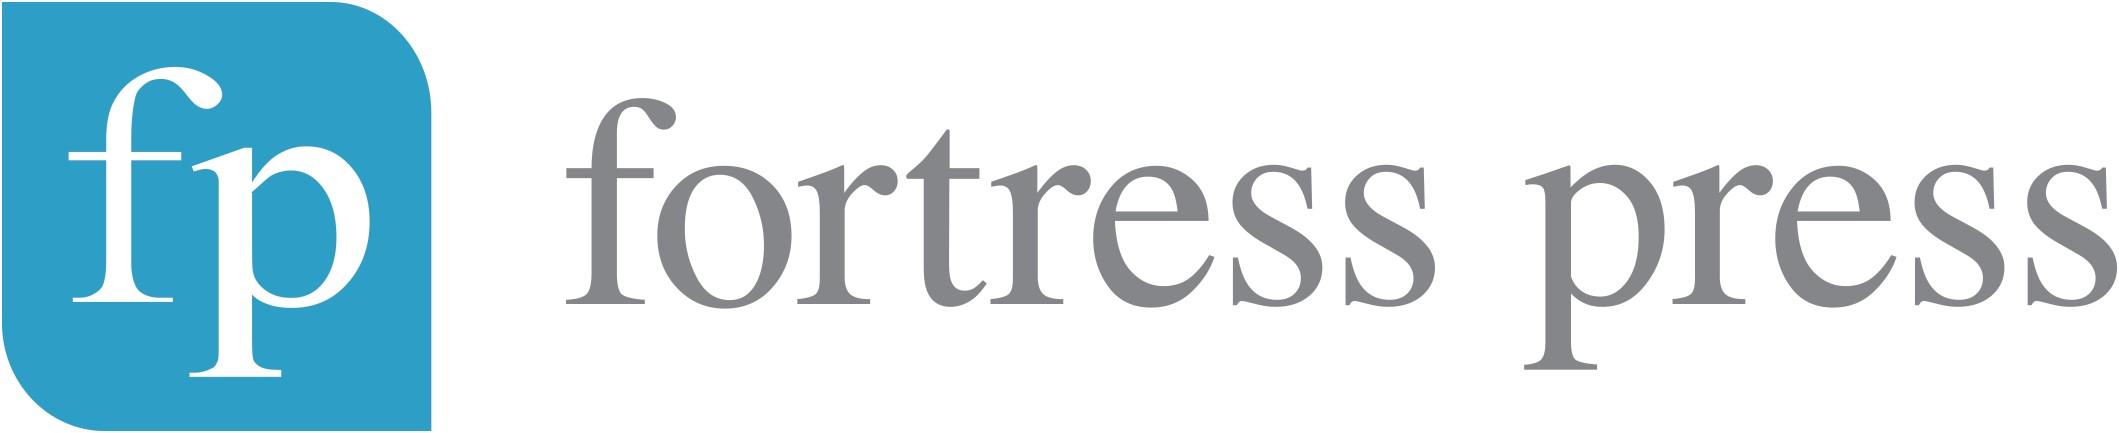 FortressPresslogo.jpg